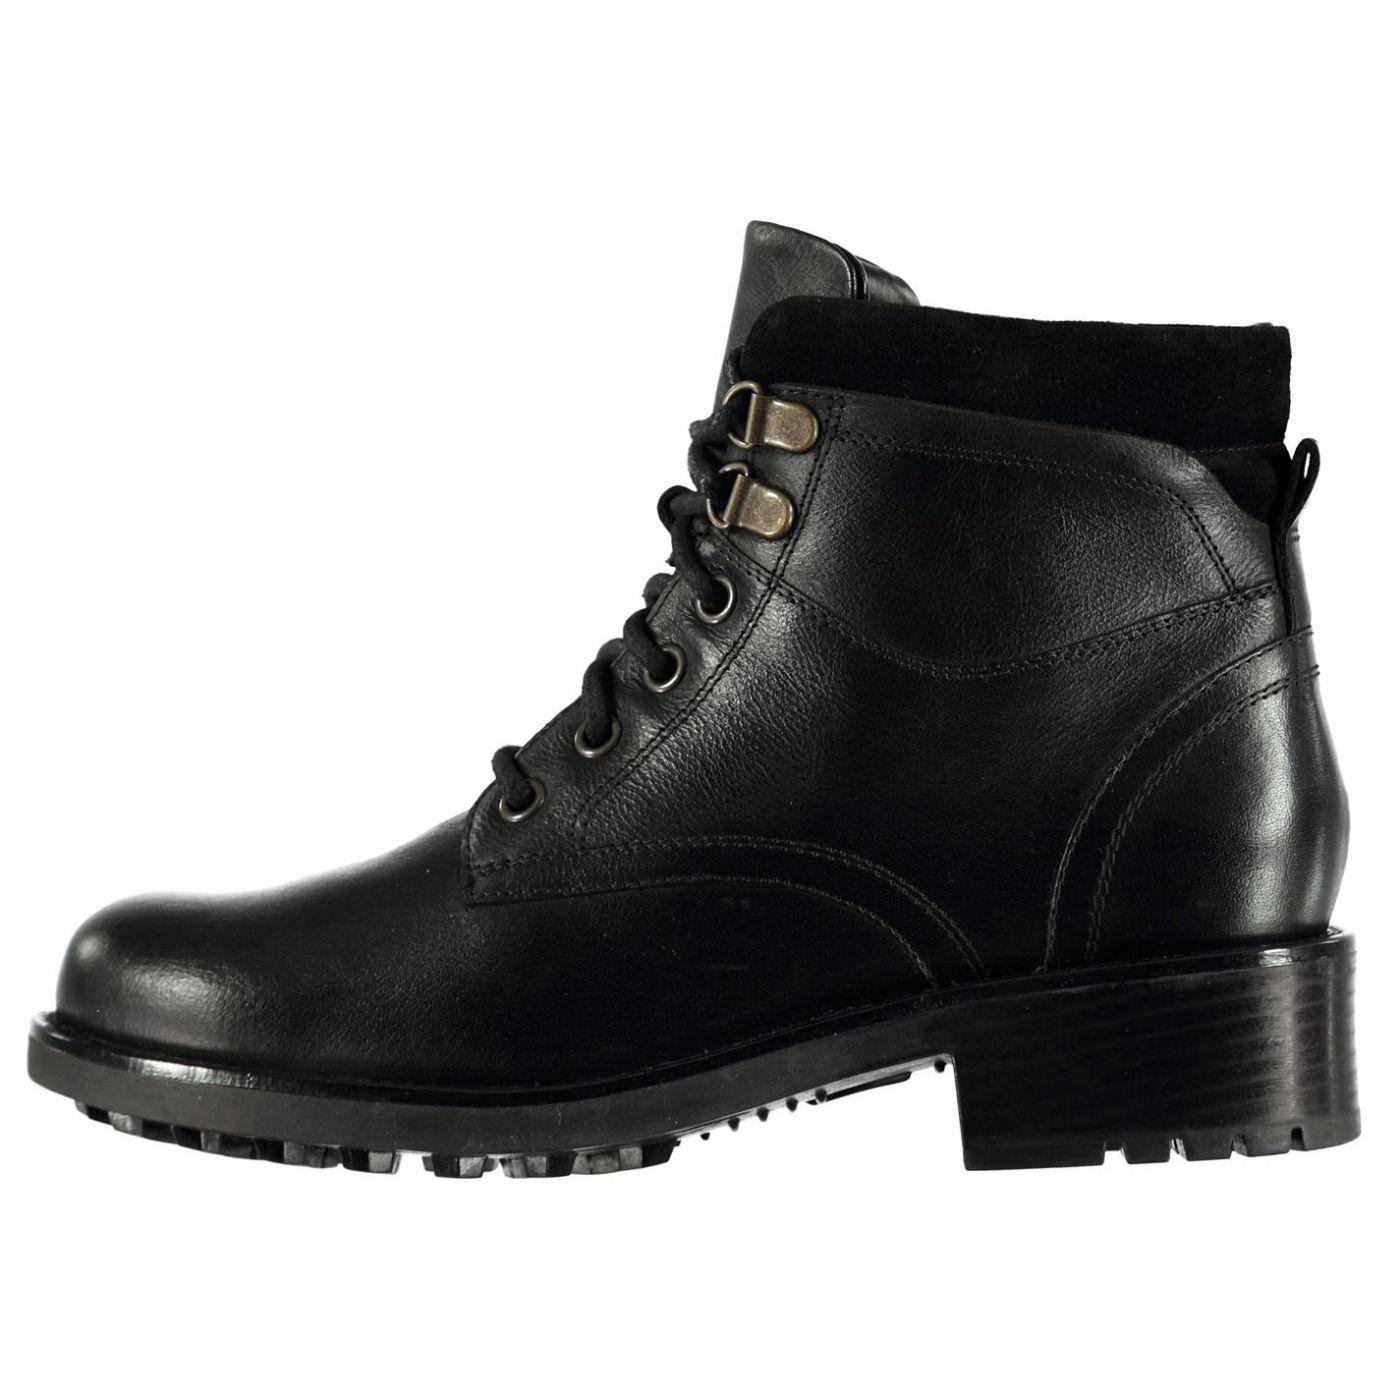 Firetrap Cabina Boots Ladies